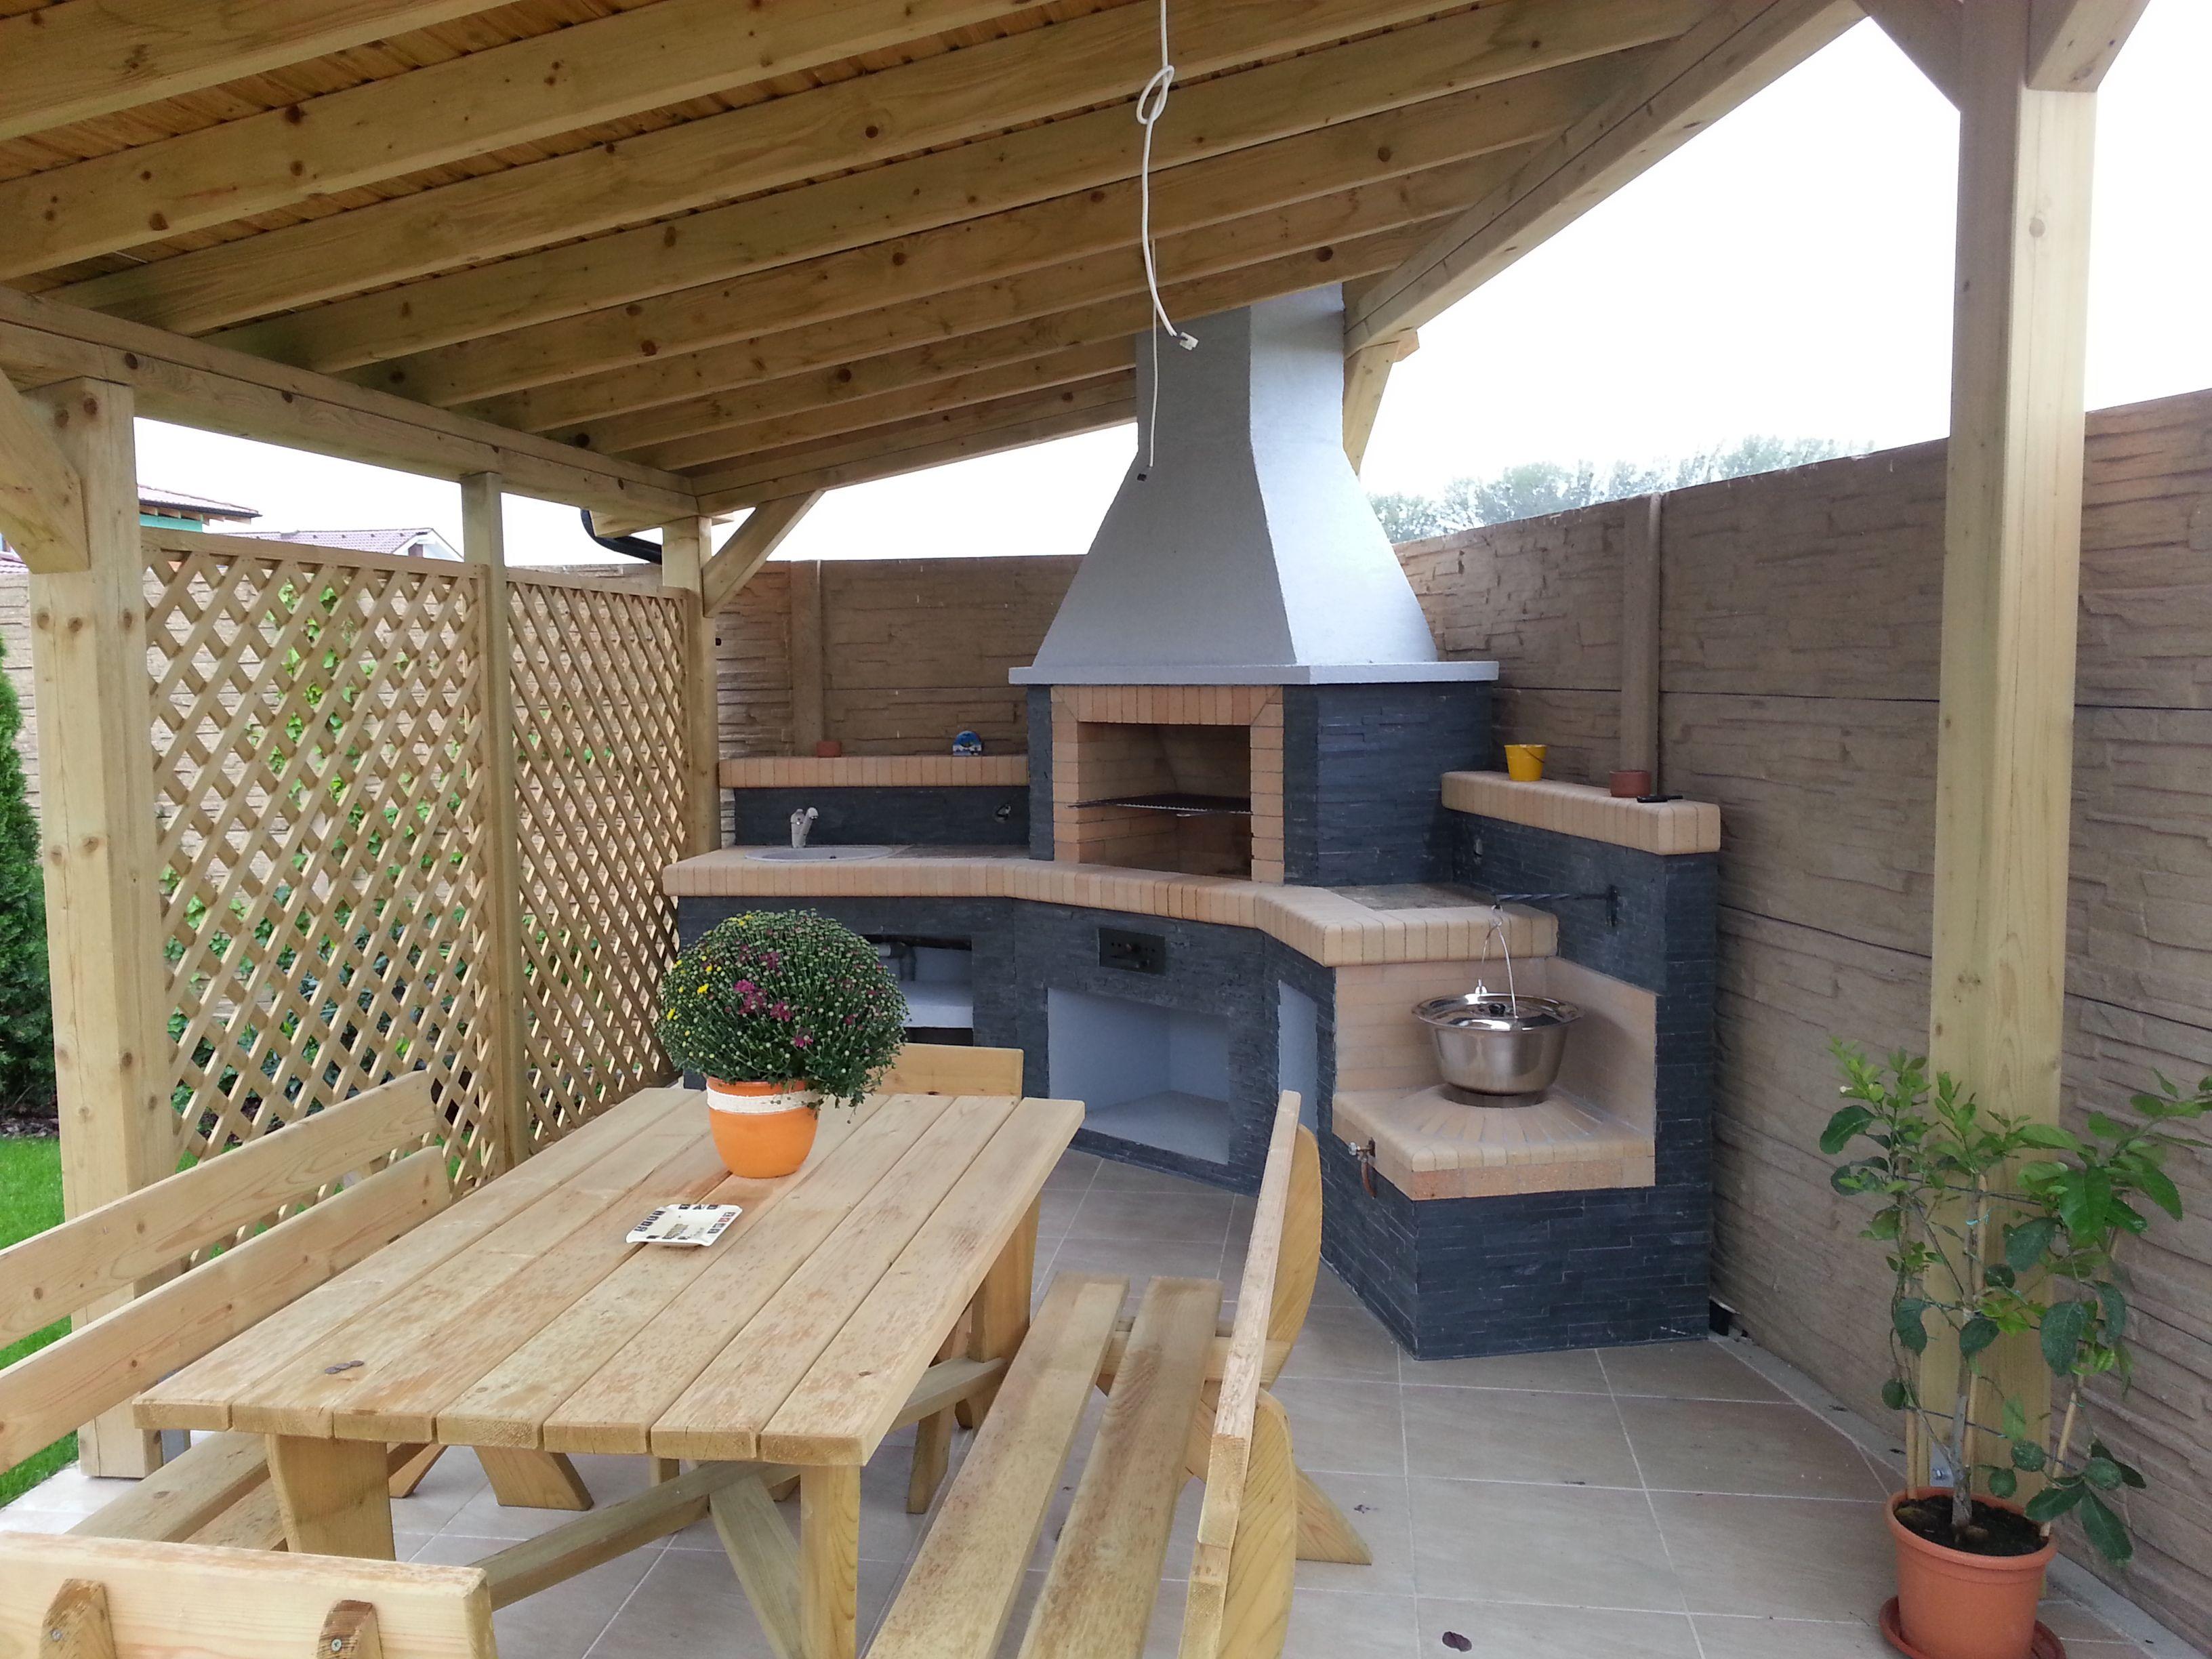 77 best parrilla images on pinterest outdoor kitchens terraces